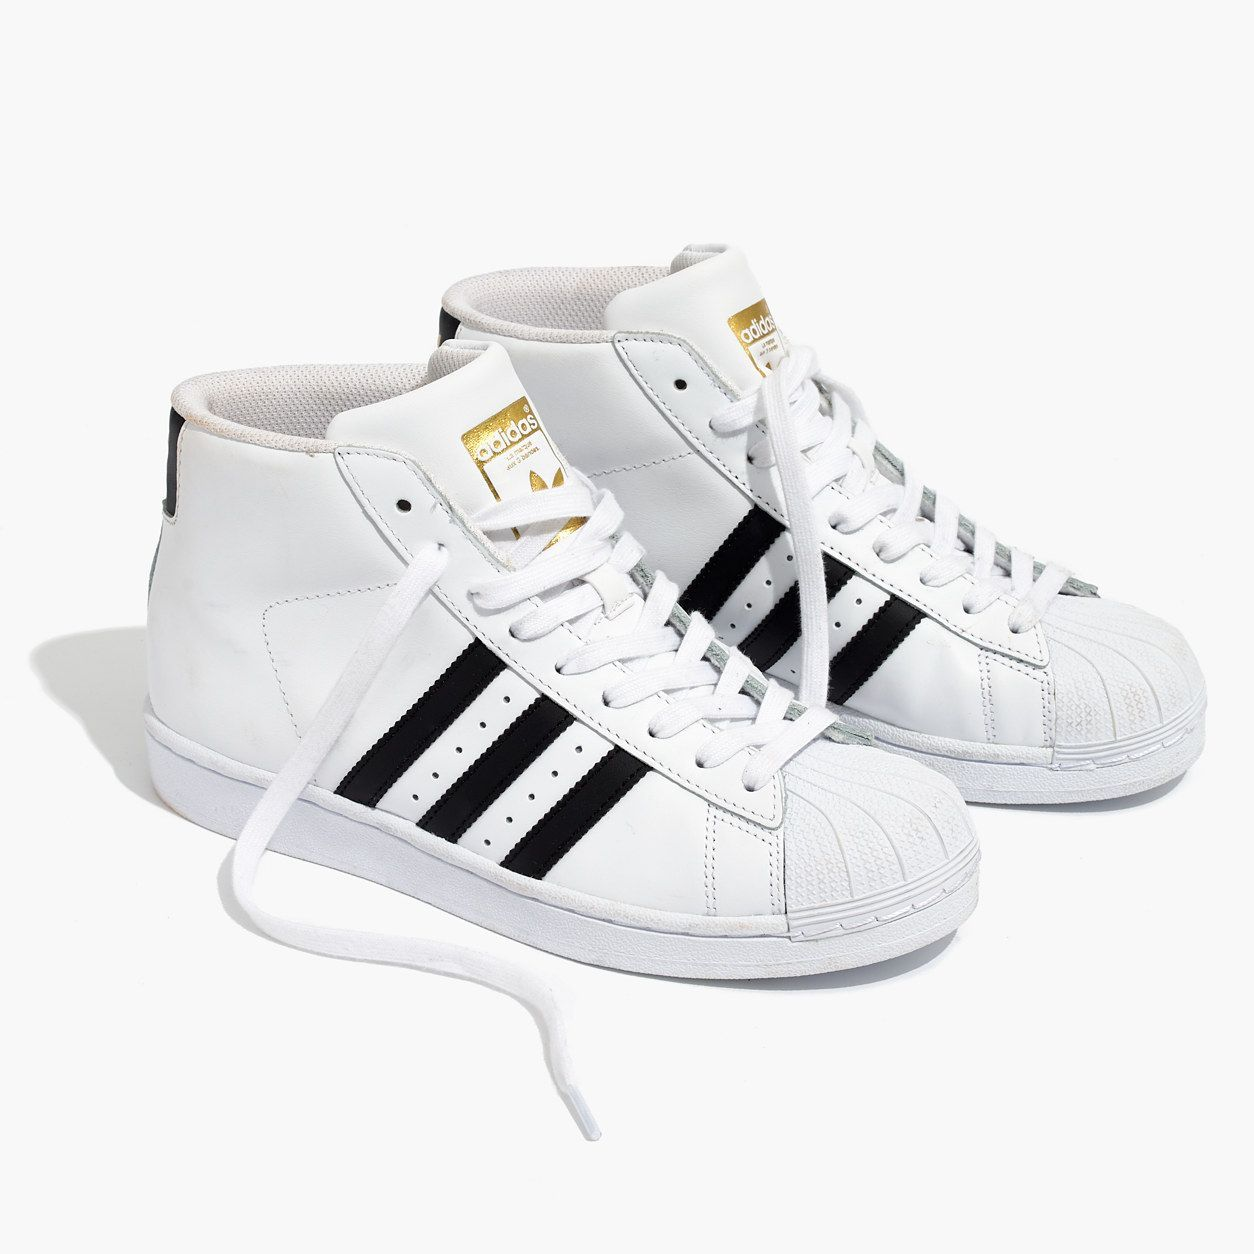 d05ea86c91dca Acquista 2 OFF QUALSIASI adidas superstar high prezzo basso CASE E ...